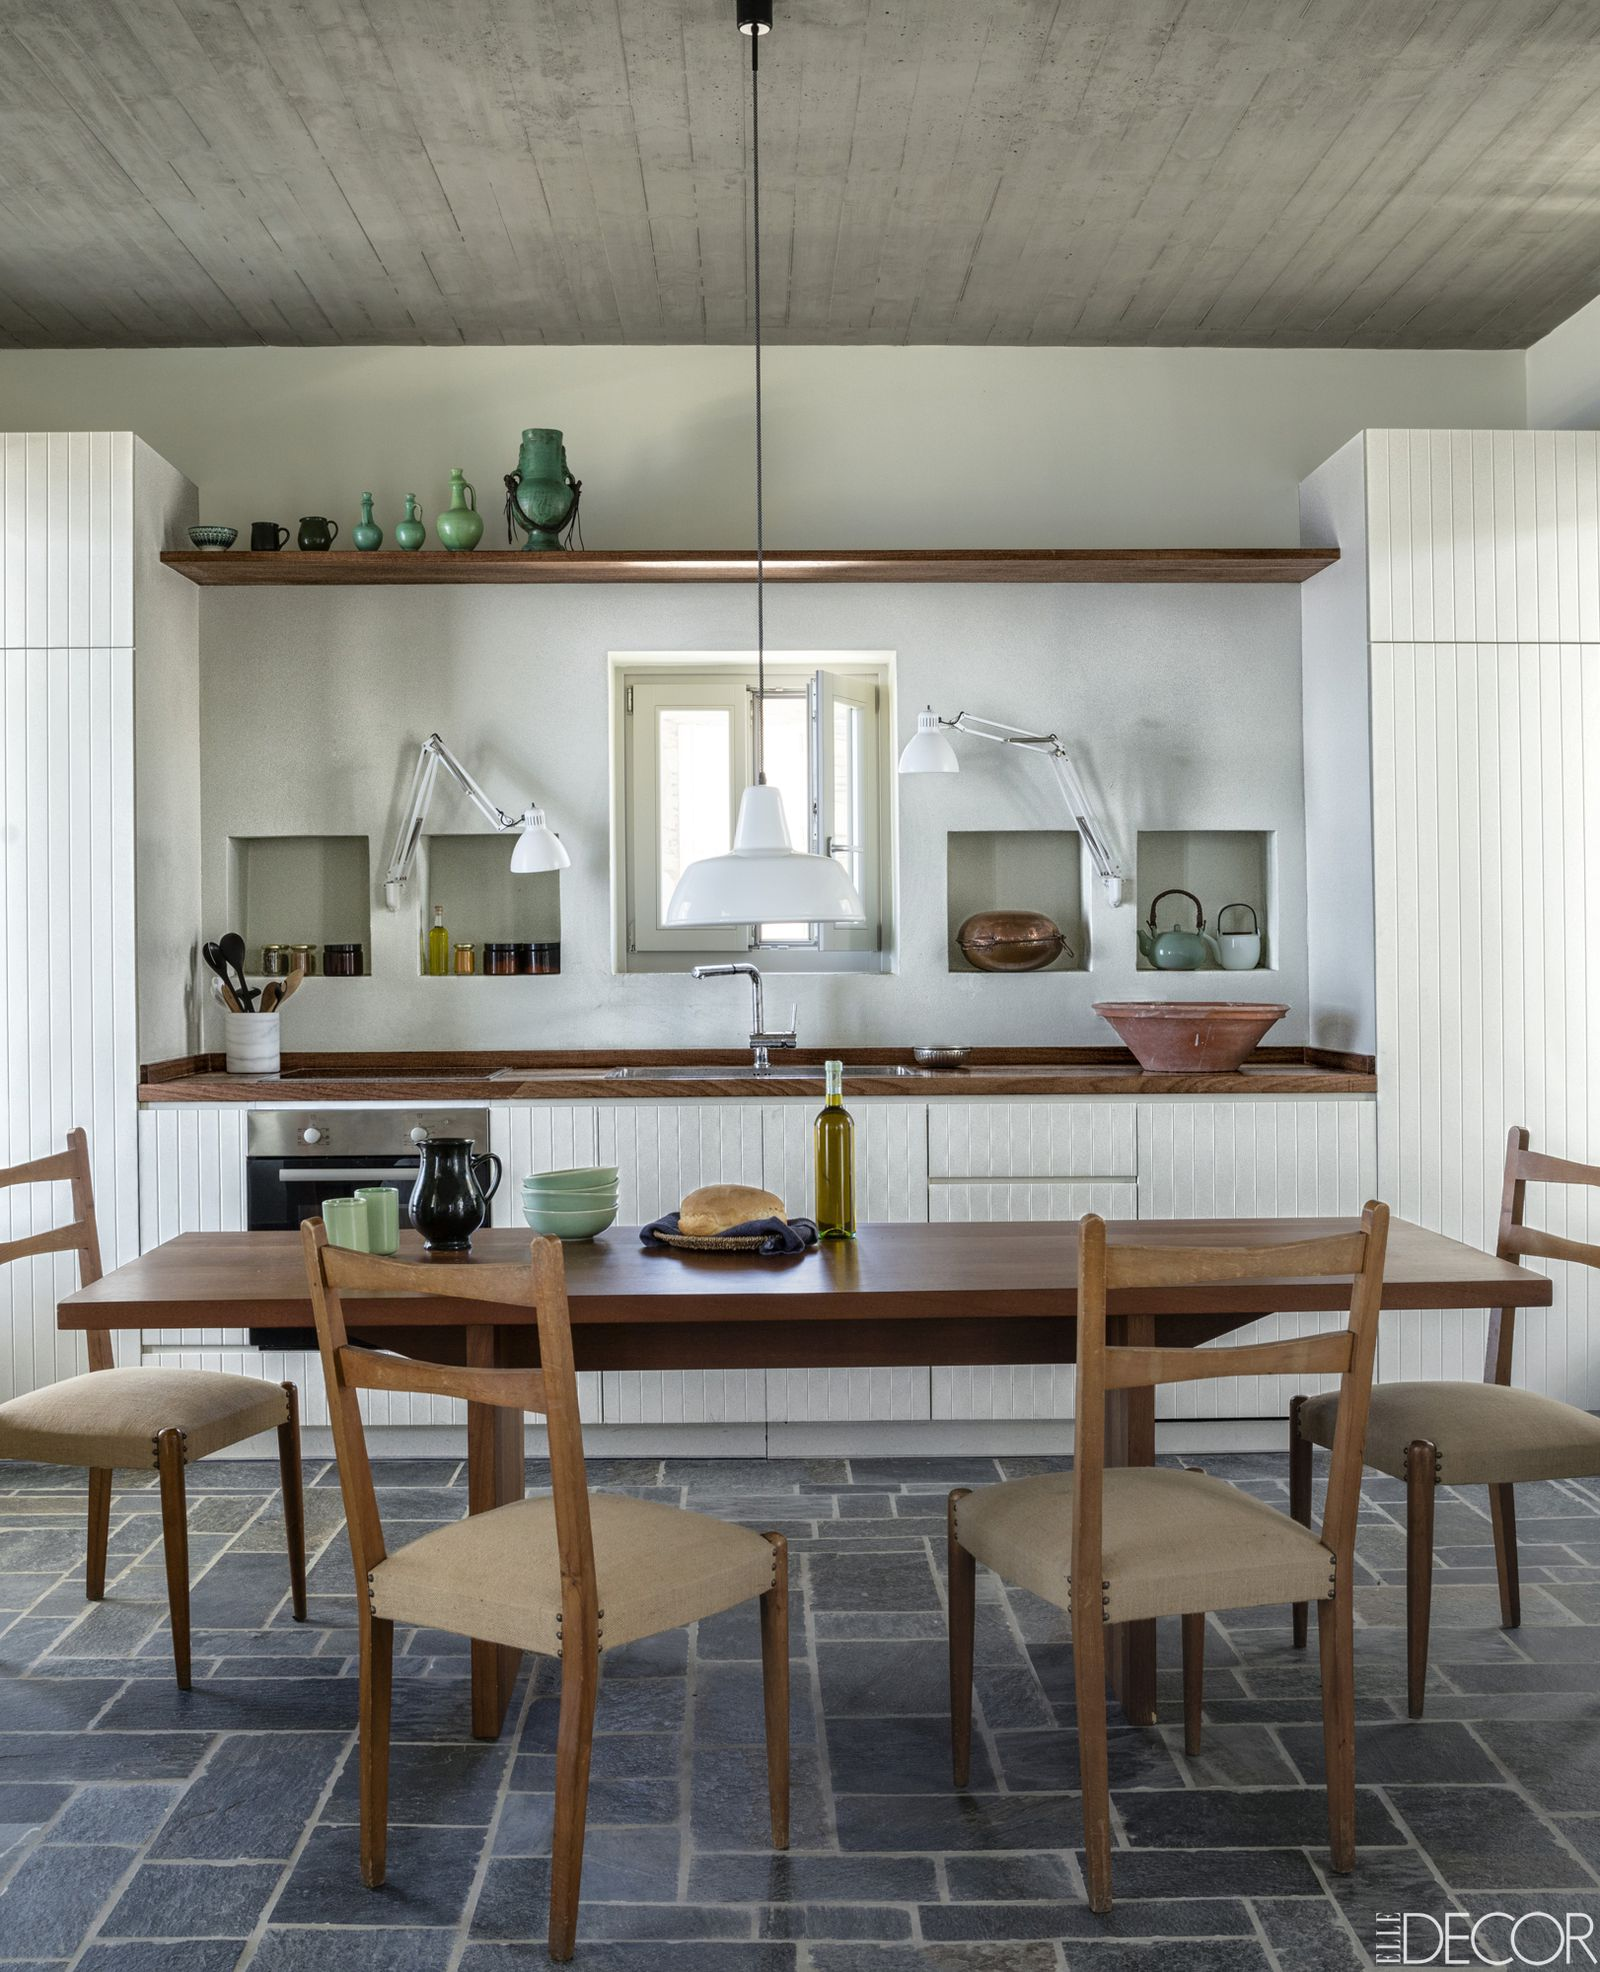 Interior Design - Room For Dining - Doreen Chambers Best Interior Designer - Brooklyn - New York - South Florida